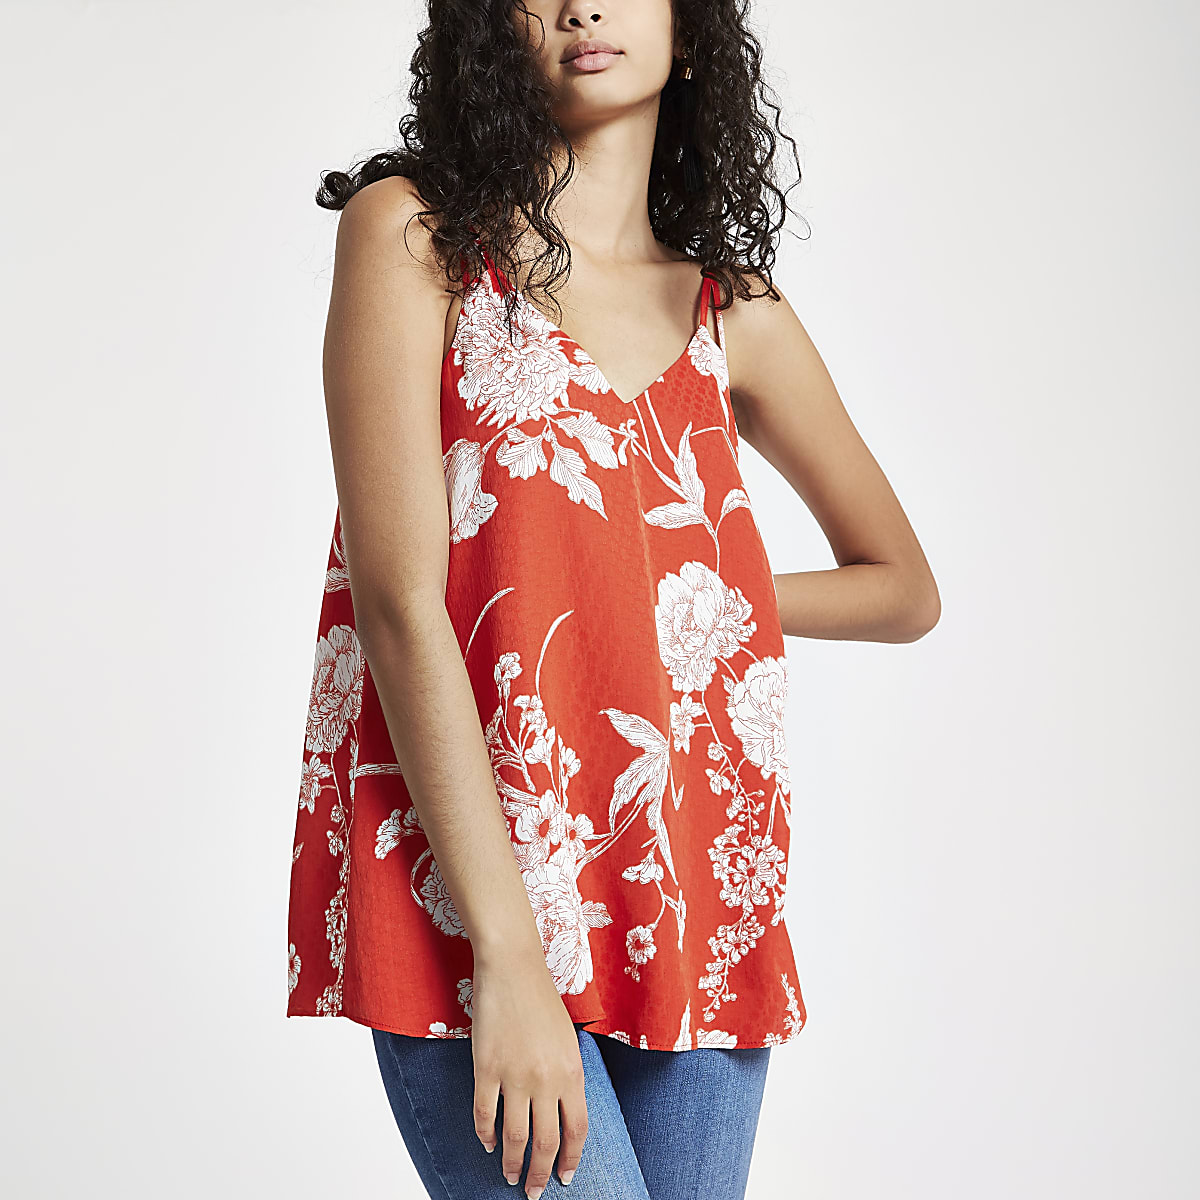 Red floral split strap cami top